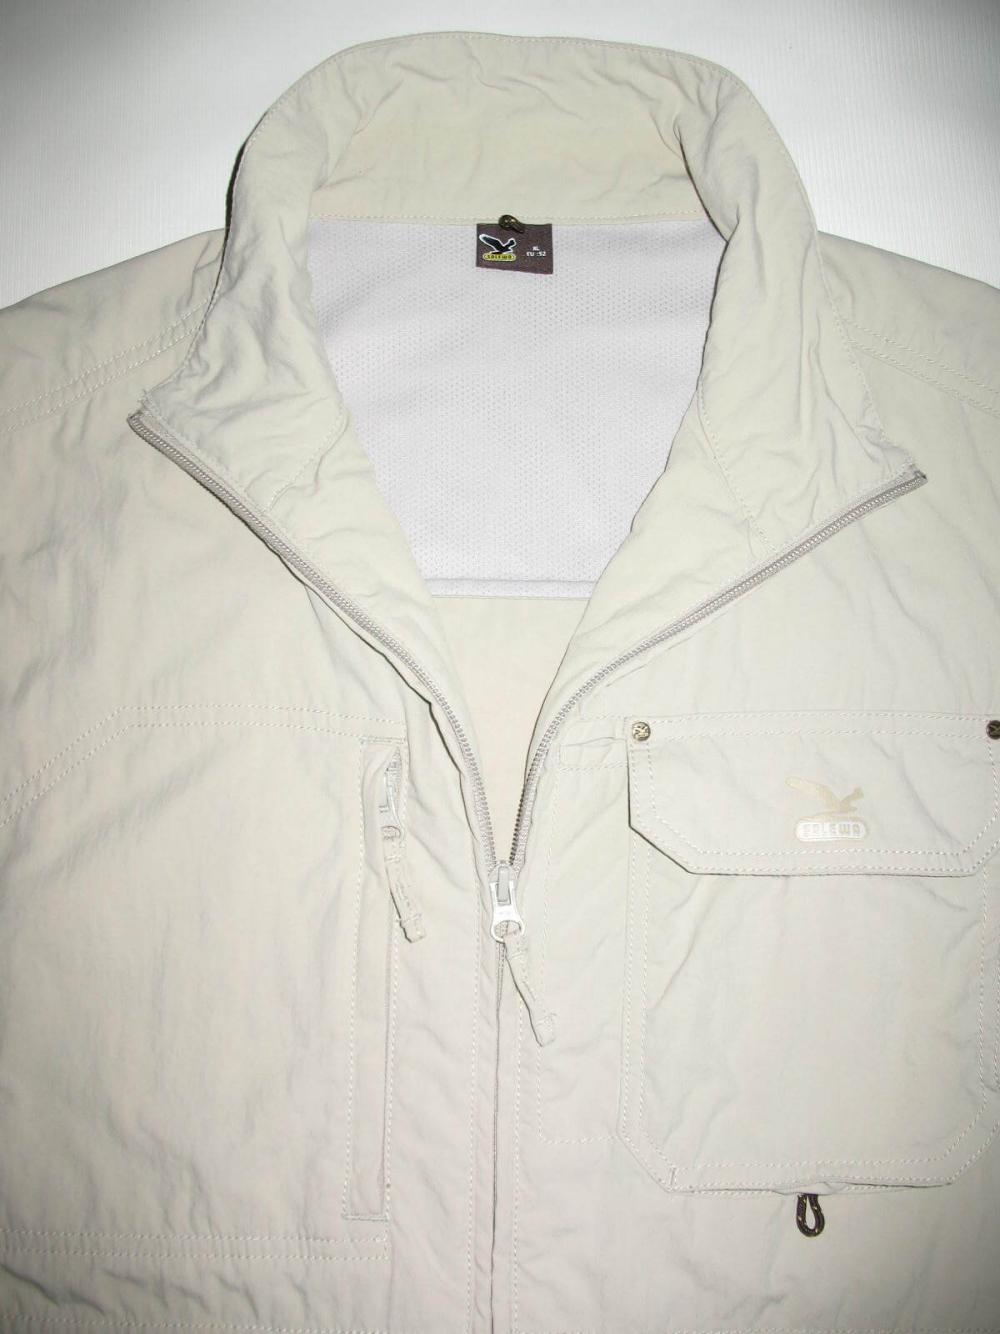 Жилет SALEWA quartz 5c dryton vest (размер 52-XL) - 5